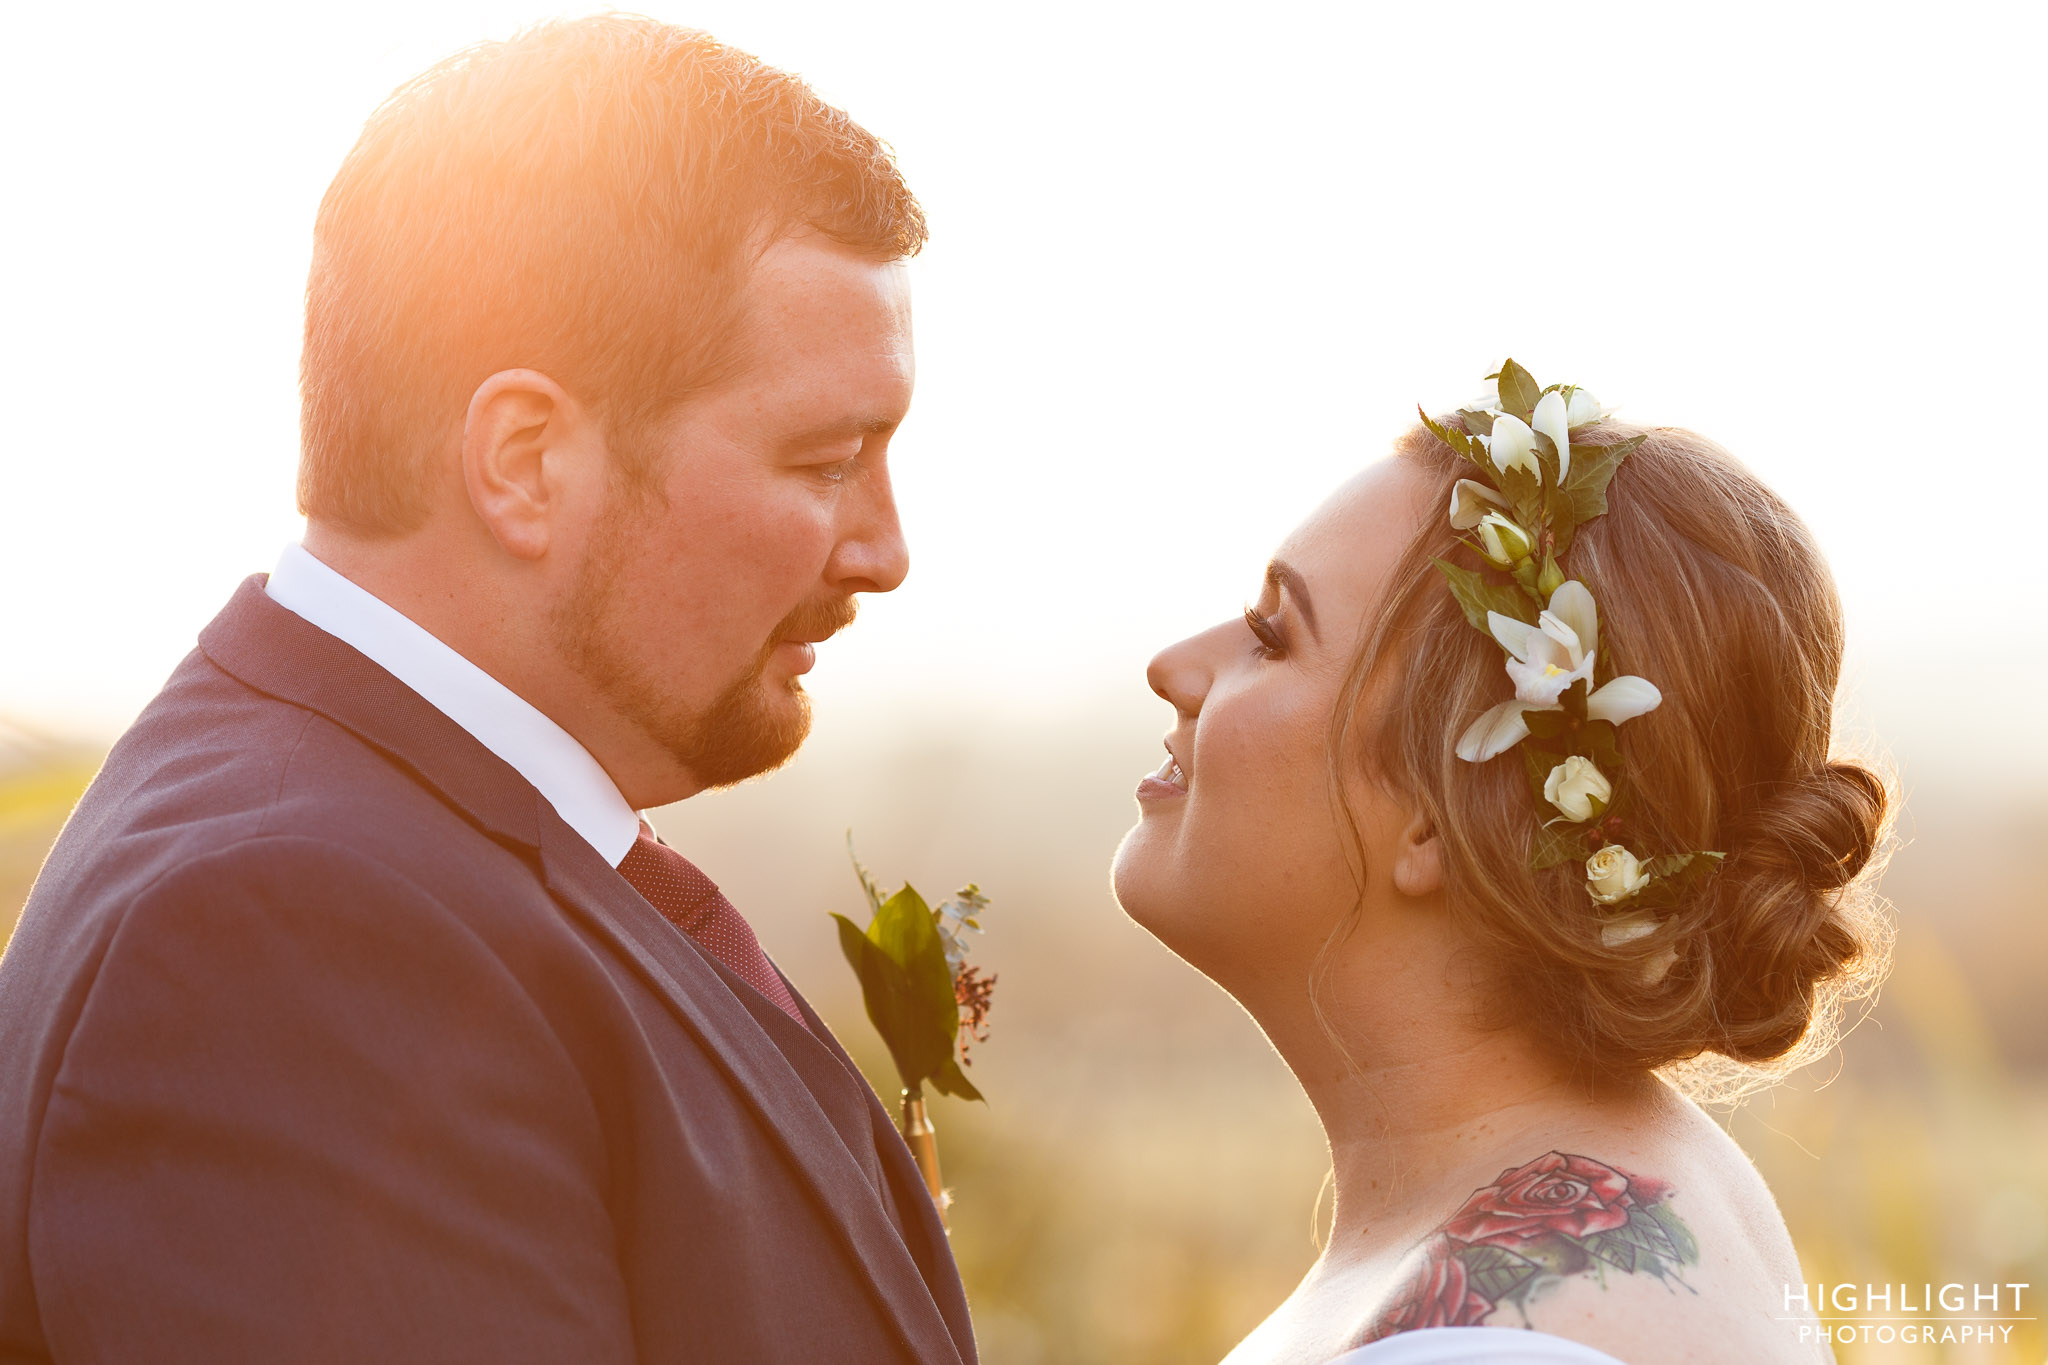 Highlight-wedding-photography-new-zealand-palmerston-north-89.jpg